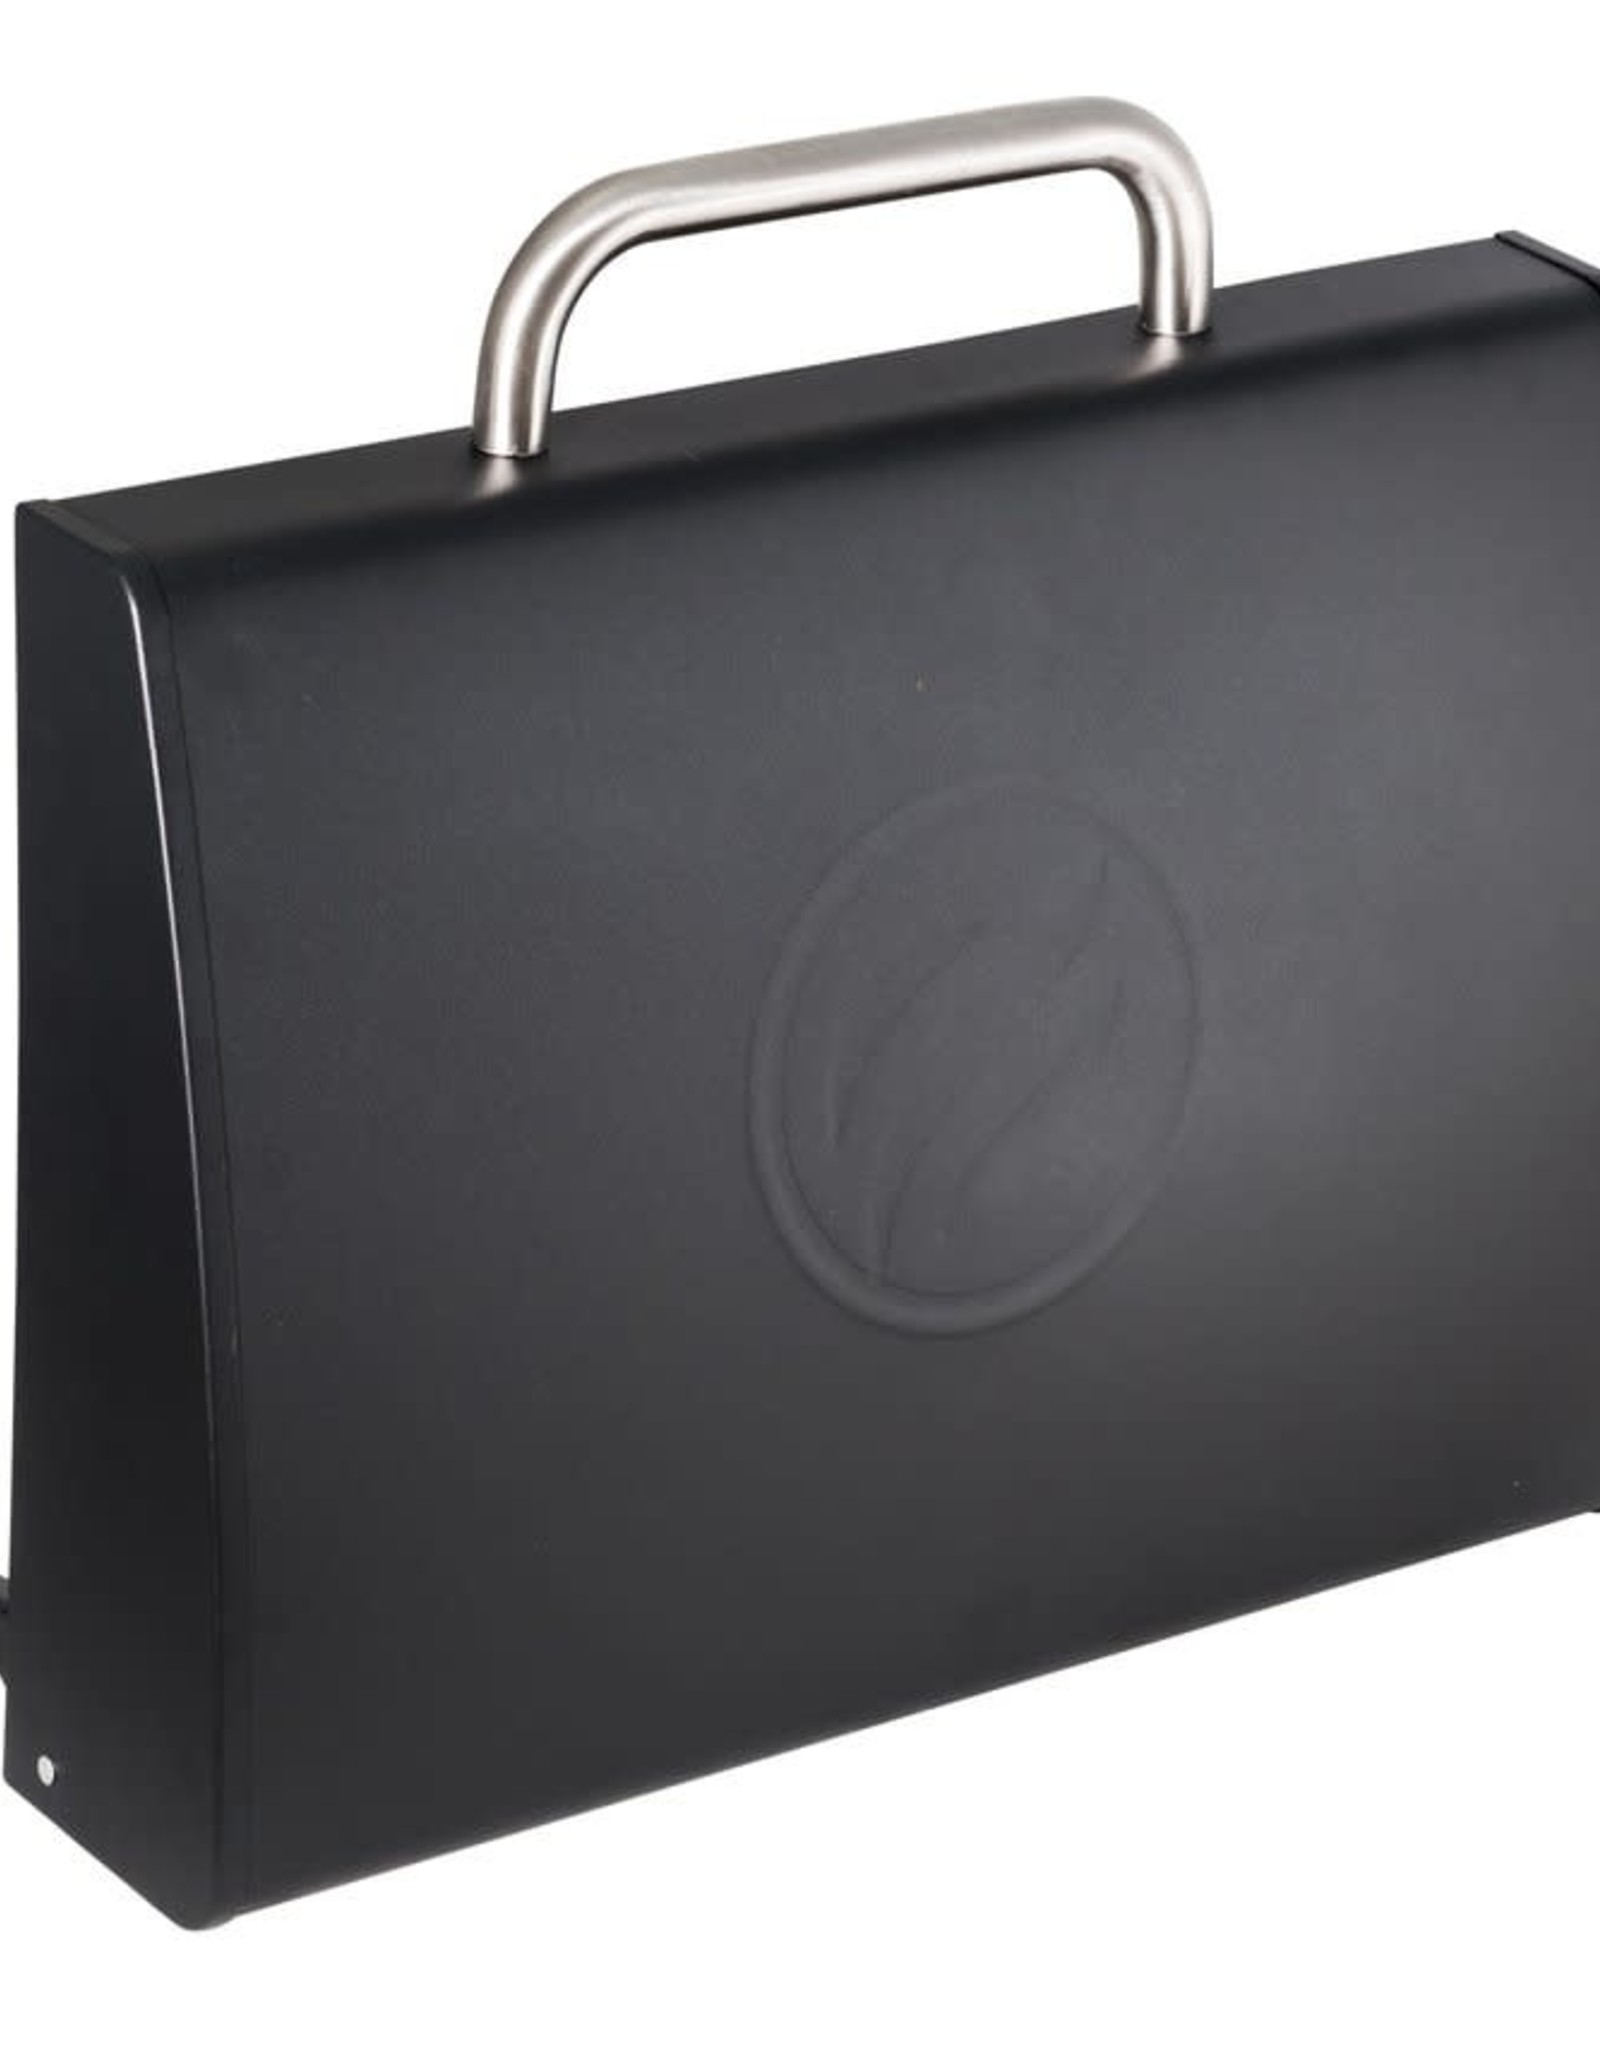 "Blackstone Blackstone 22"" Table Top Griddle Hood 5011"